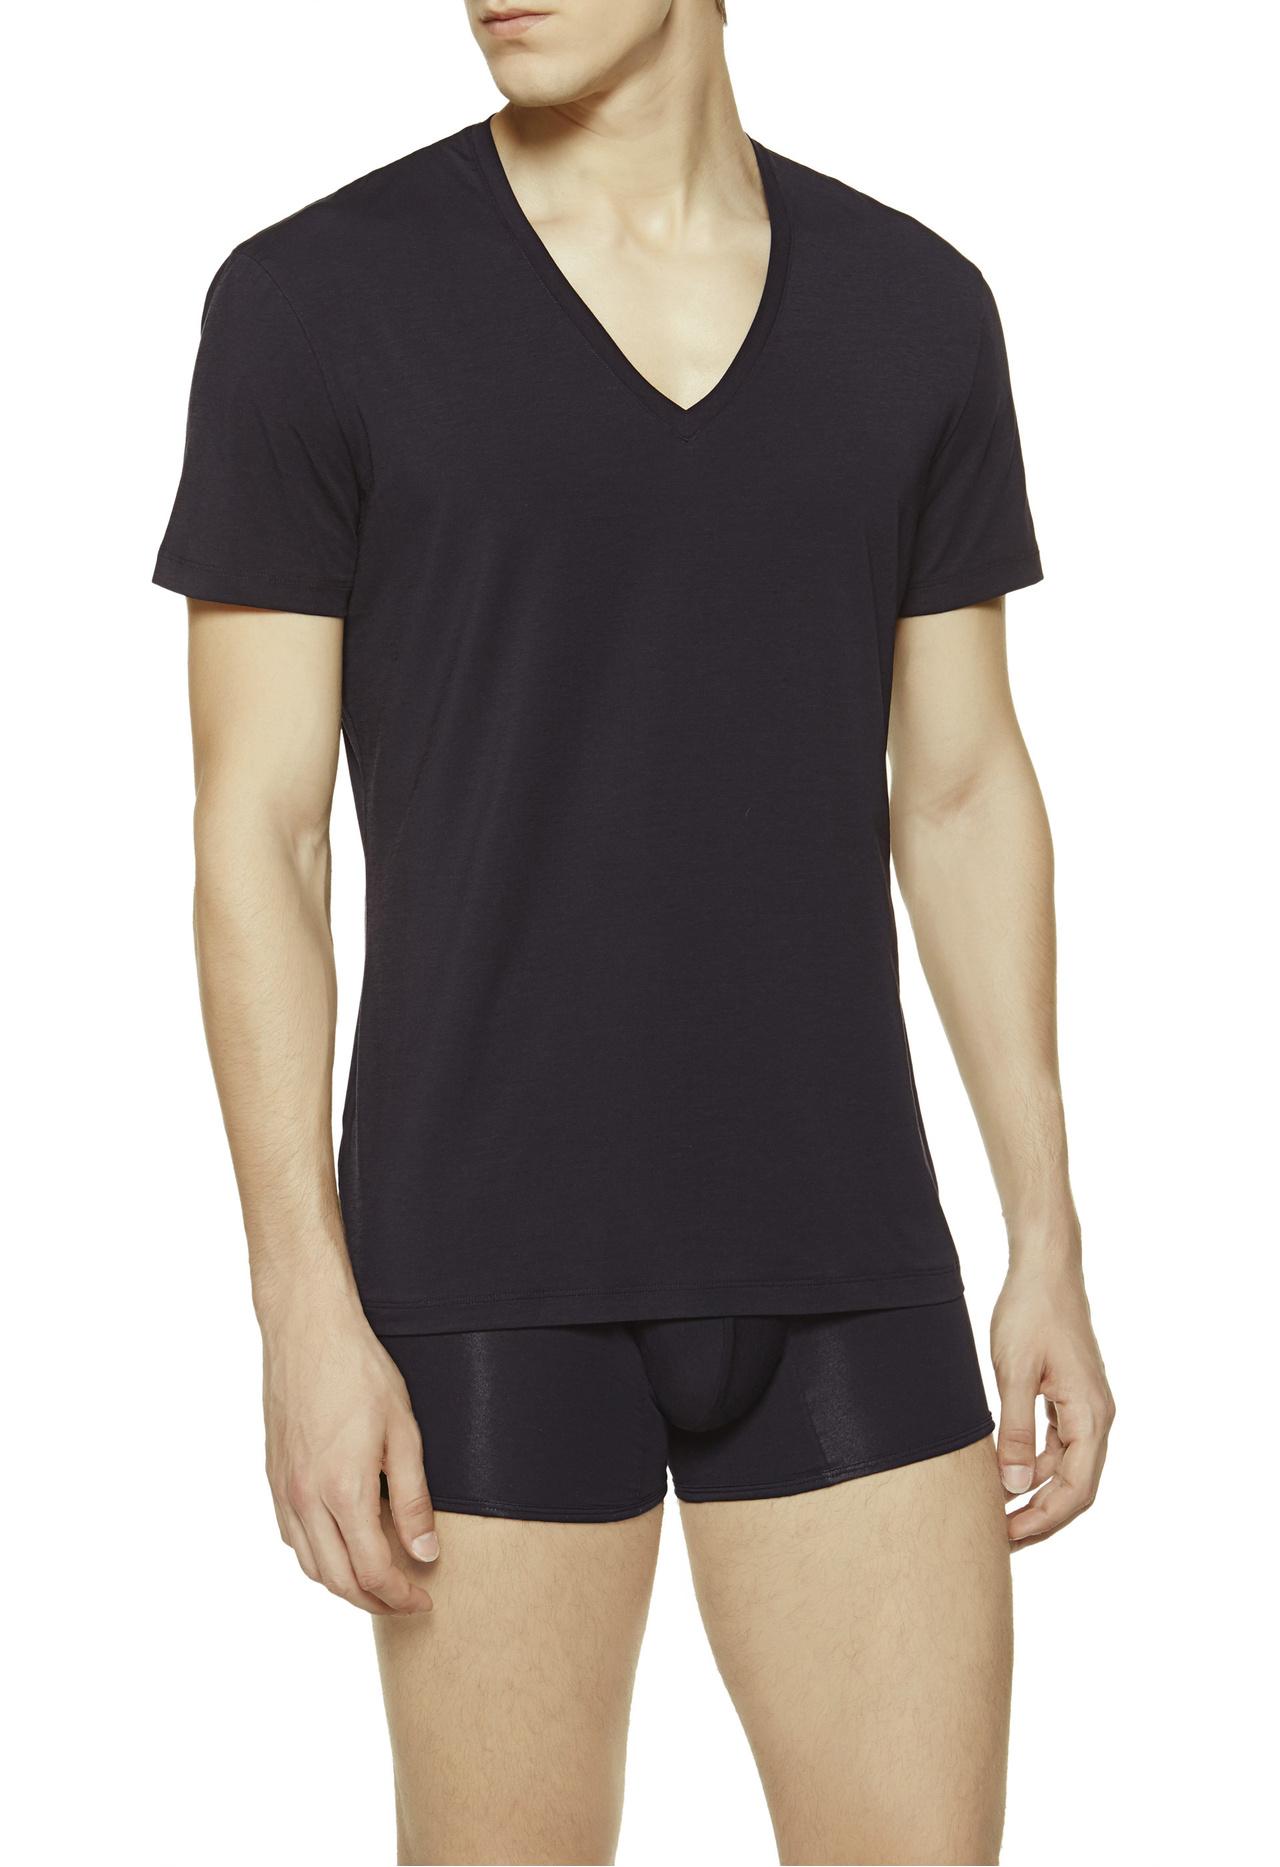 Lyst La Perla V Neck T Shirt In Black For Men